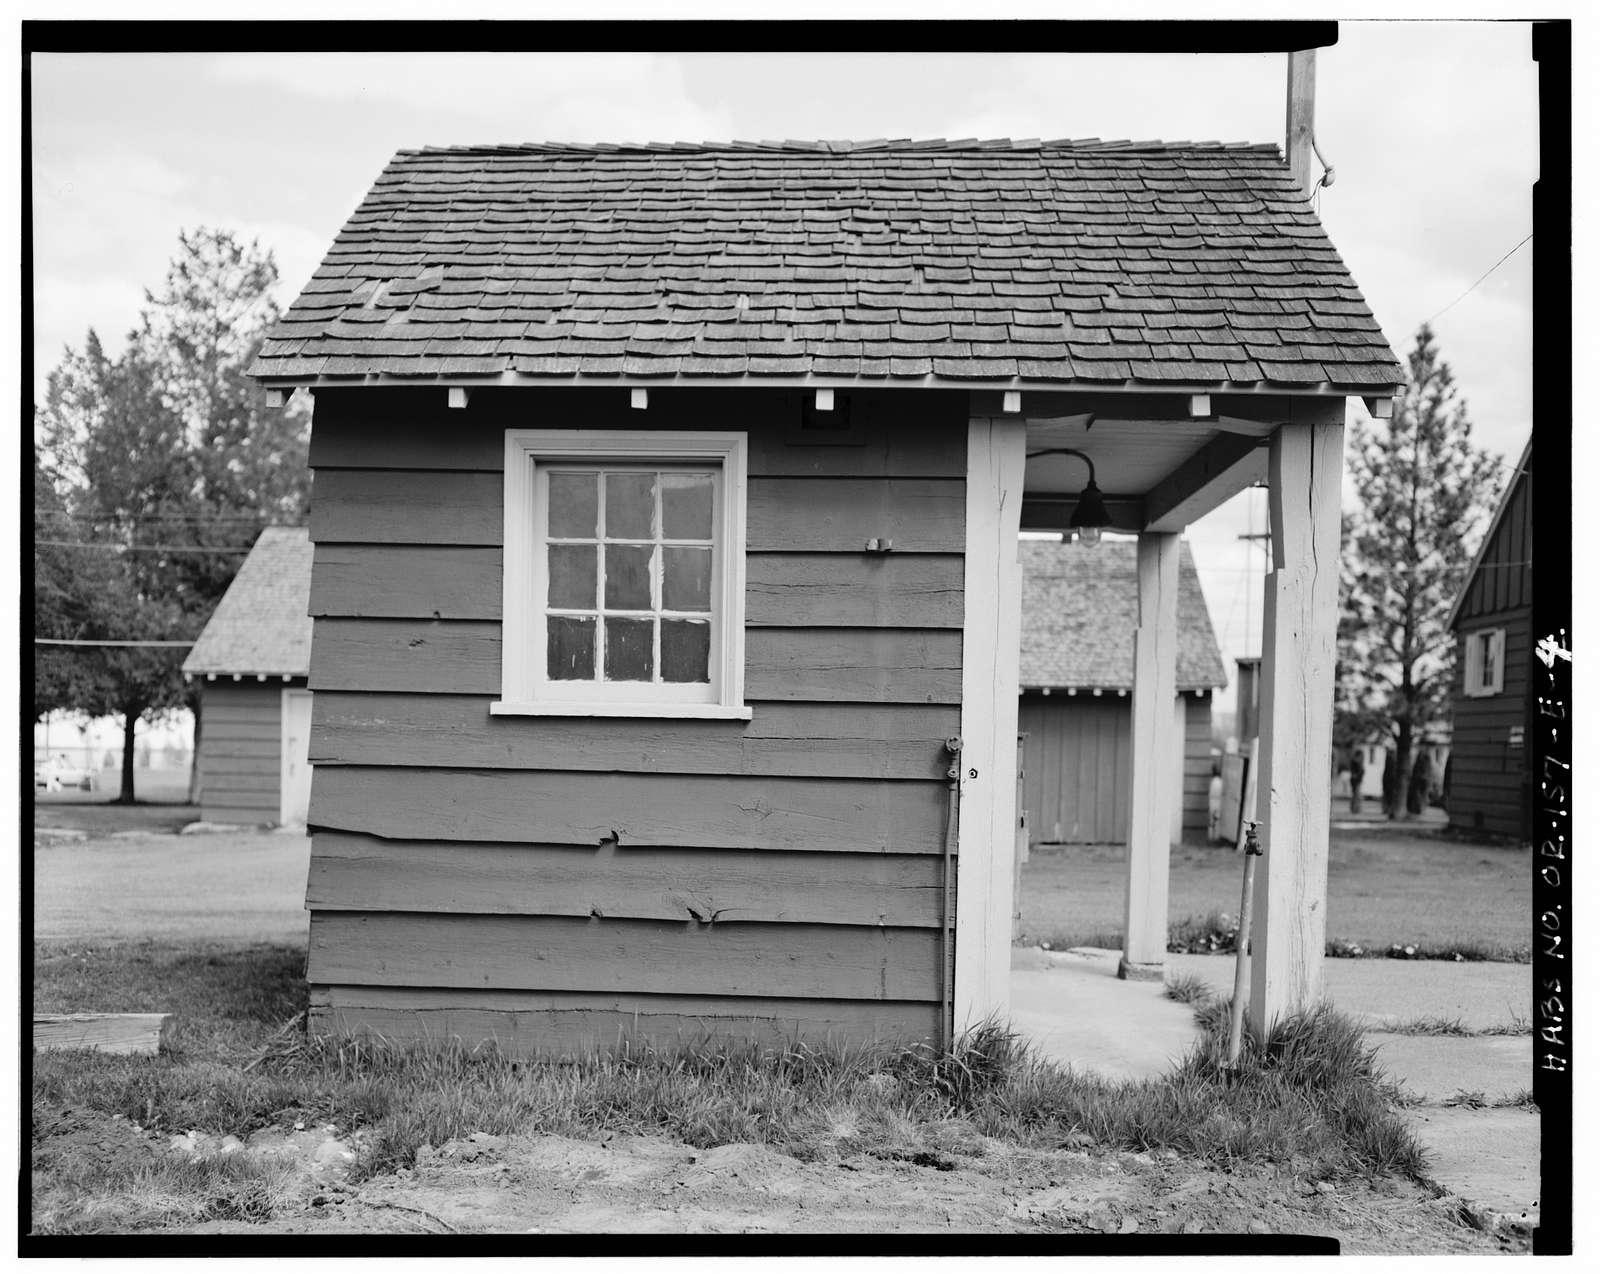 Wallowa Ranger Station, Gas House, 602 First Street, Wallowa, Wallowa County, OR